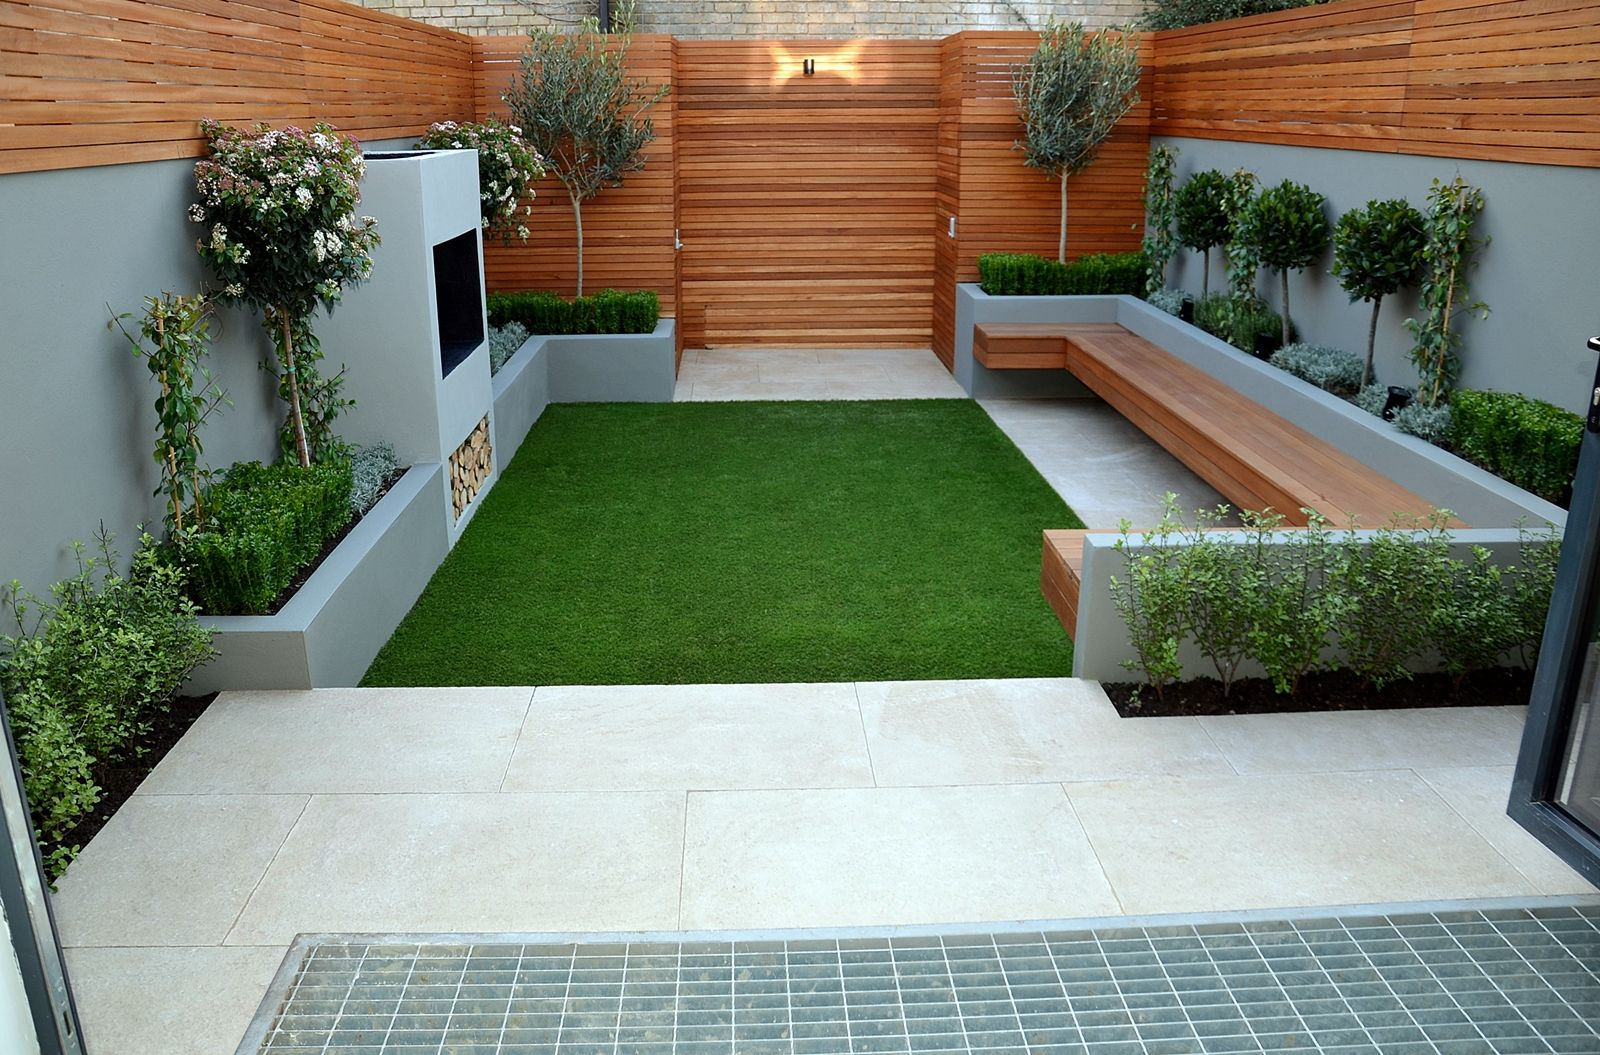 Small Garden Design Tips And Tricks Description From Pinterest